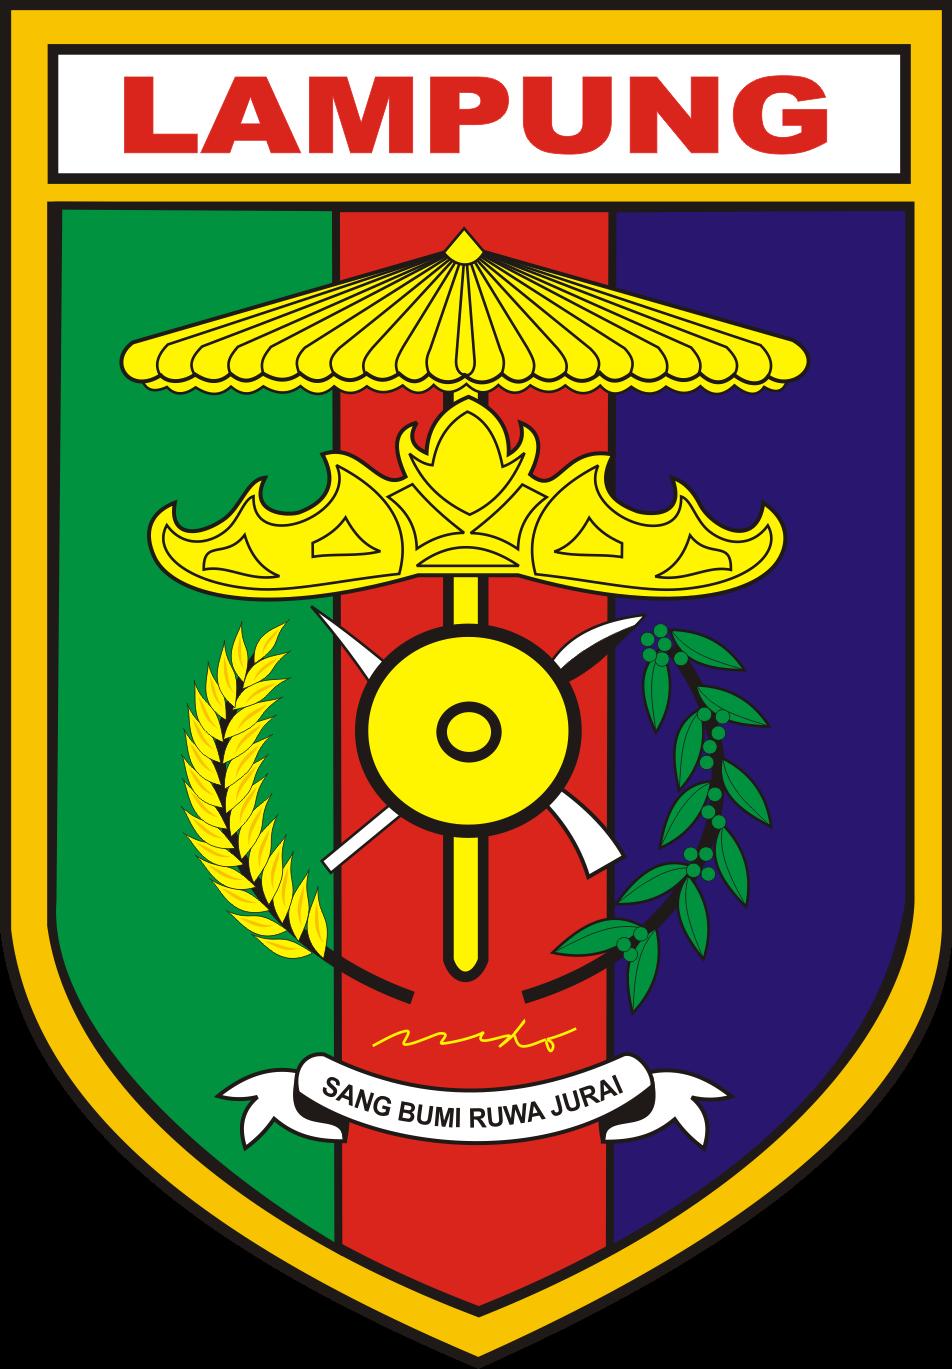 Daftar Cerita Rakyat Lampung